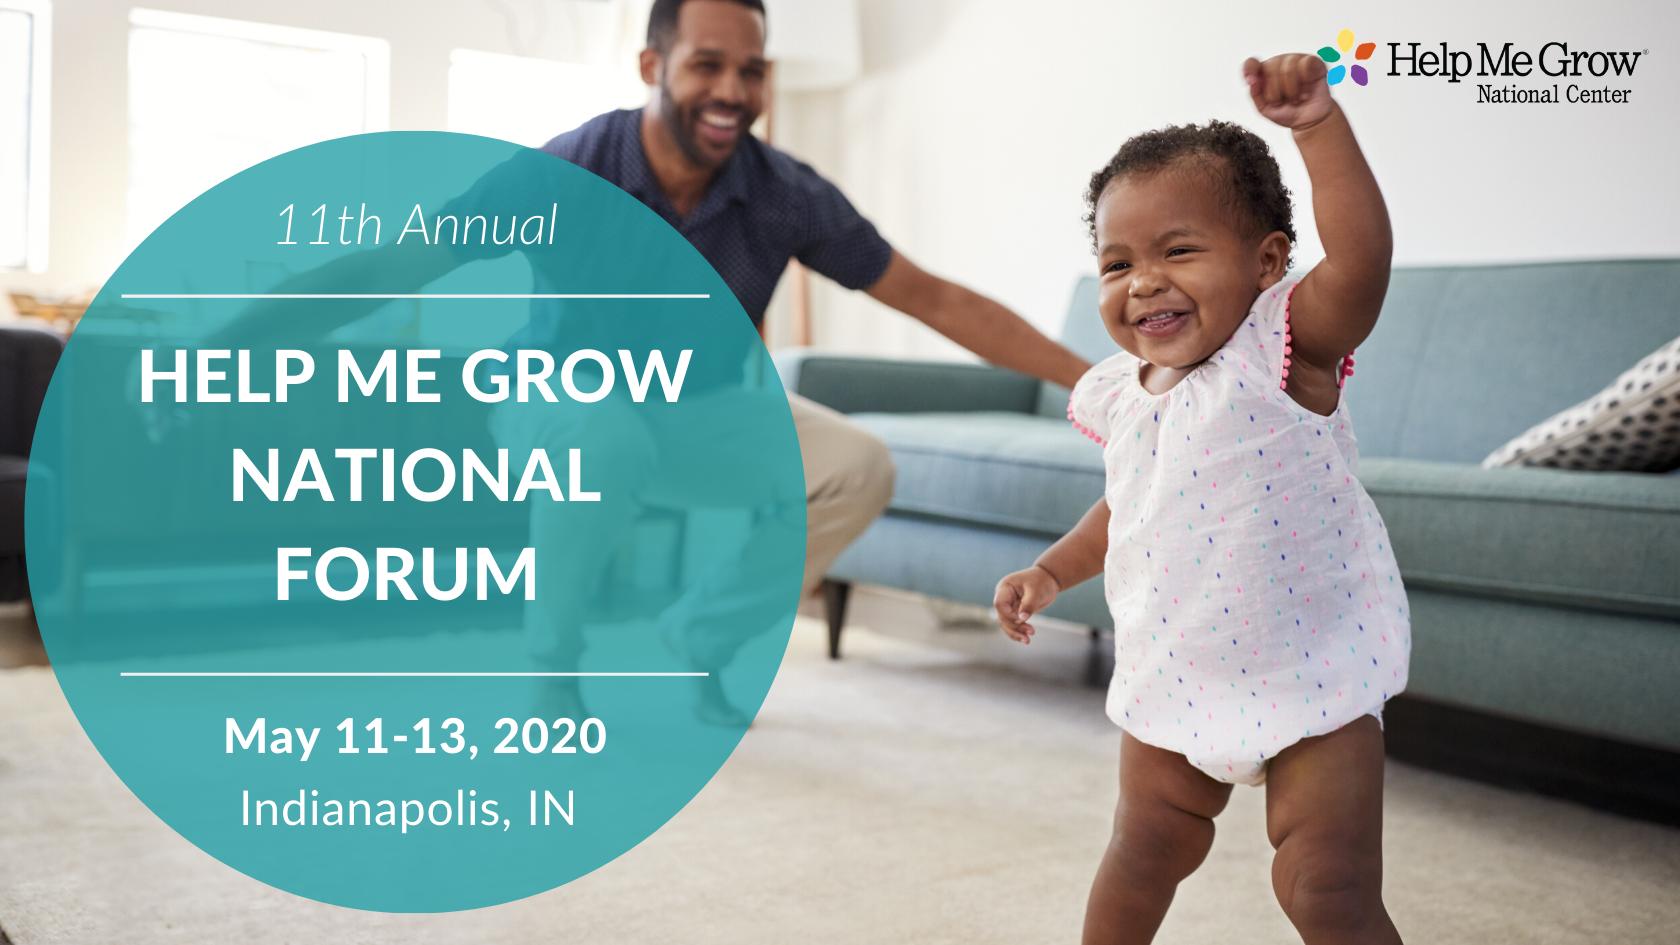 2020 Help Me Grow National Forum